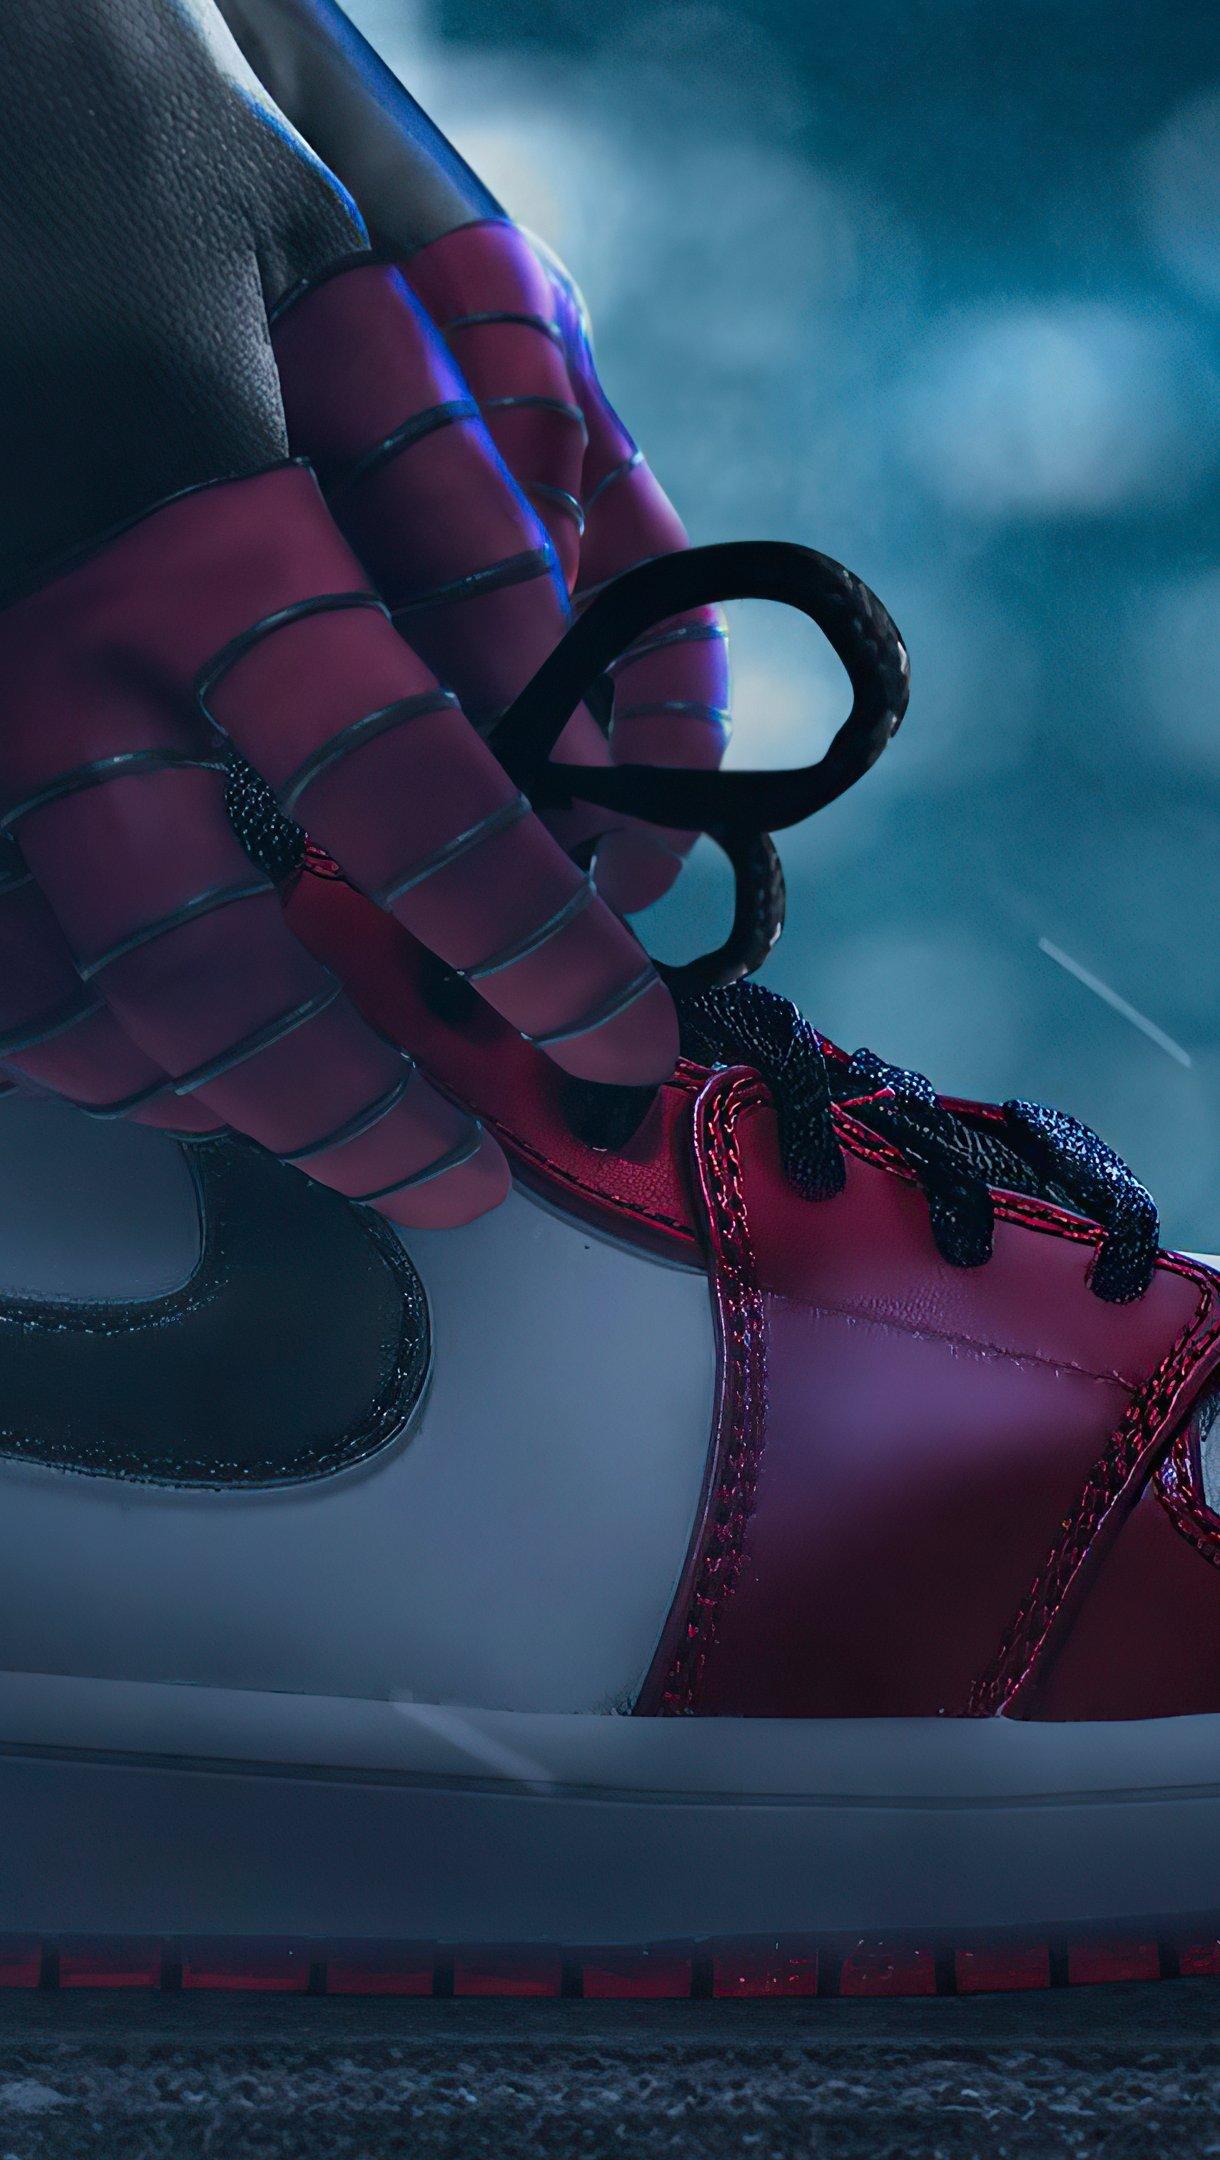 Fondos de pantalla Air Jordan Miles Morales como Spiderman Vertical